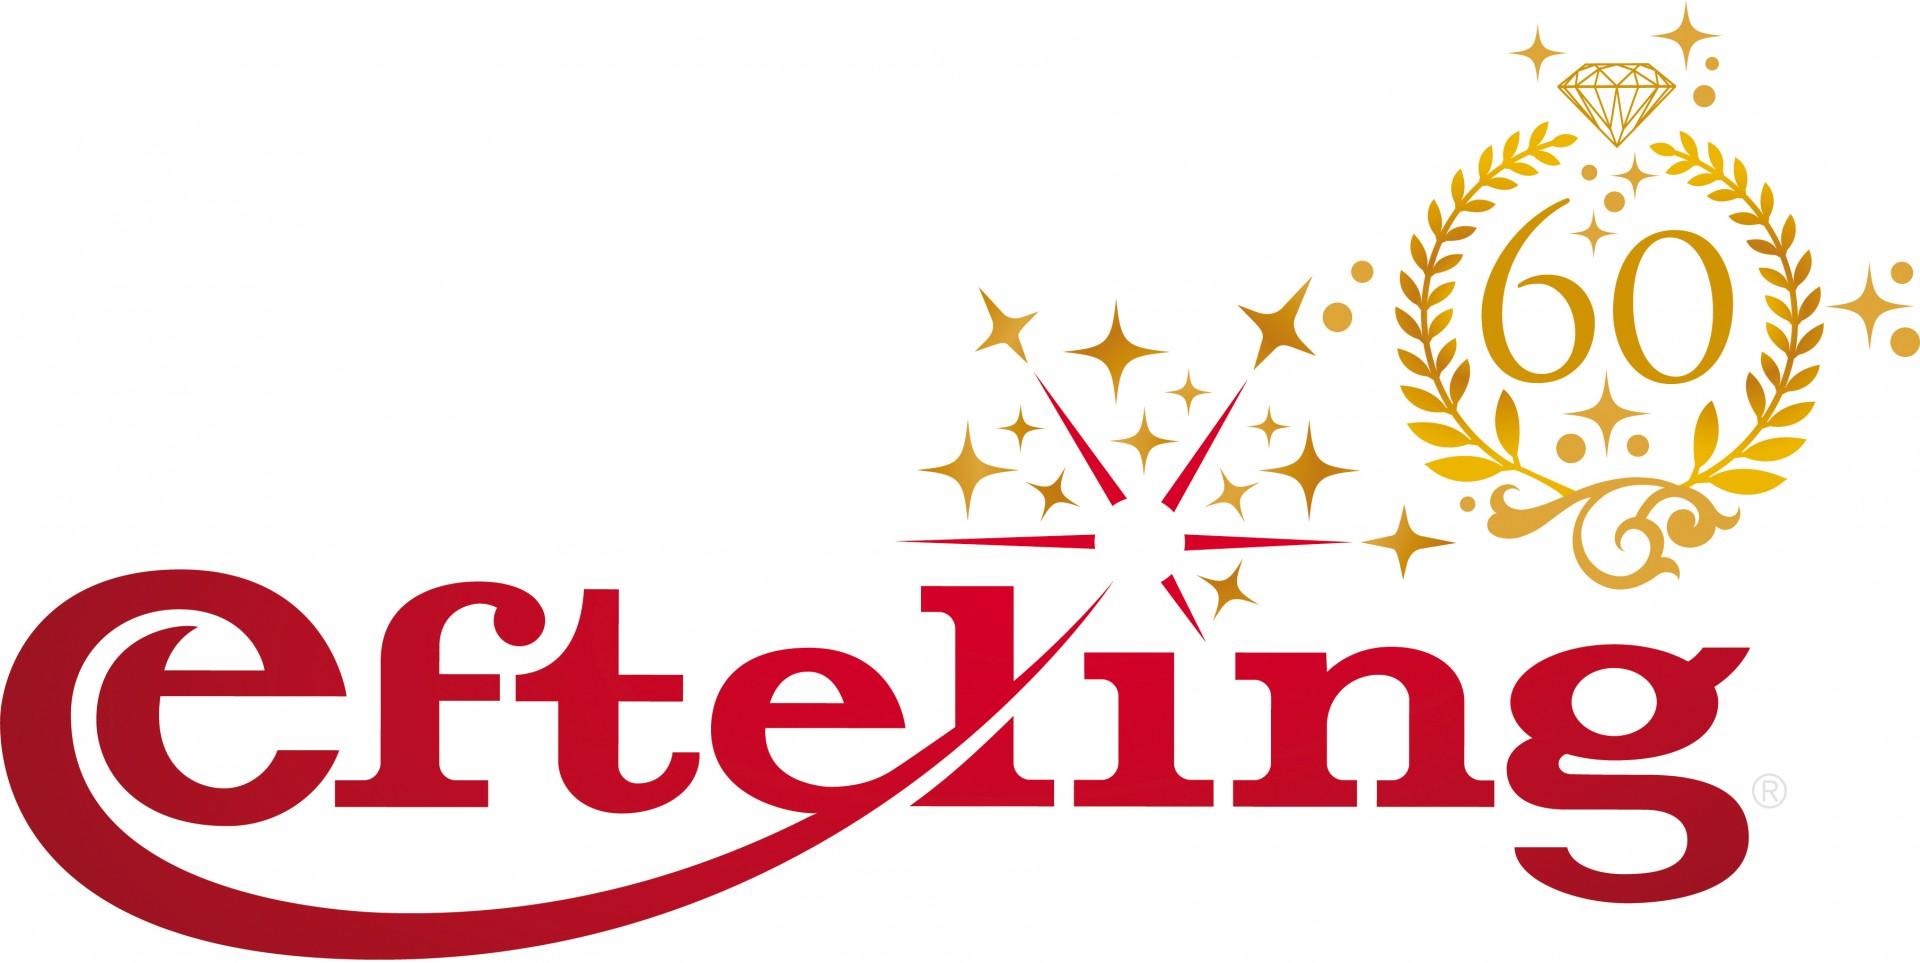 60 jarig bestaan efteling Efteling viert jaar lang feest rond 60 jarig jubileum 60 jarig bestaan efteling